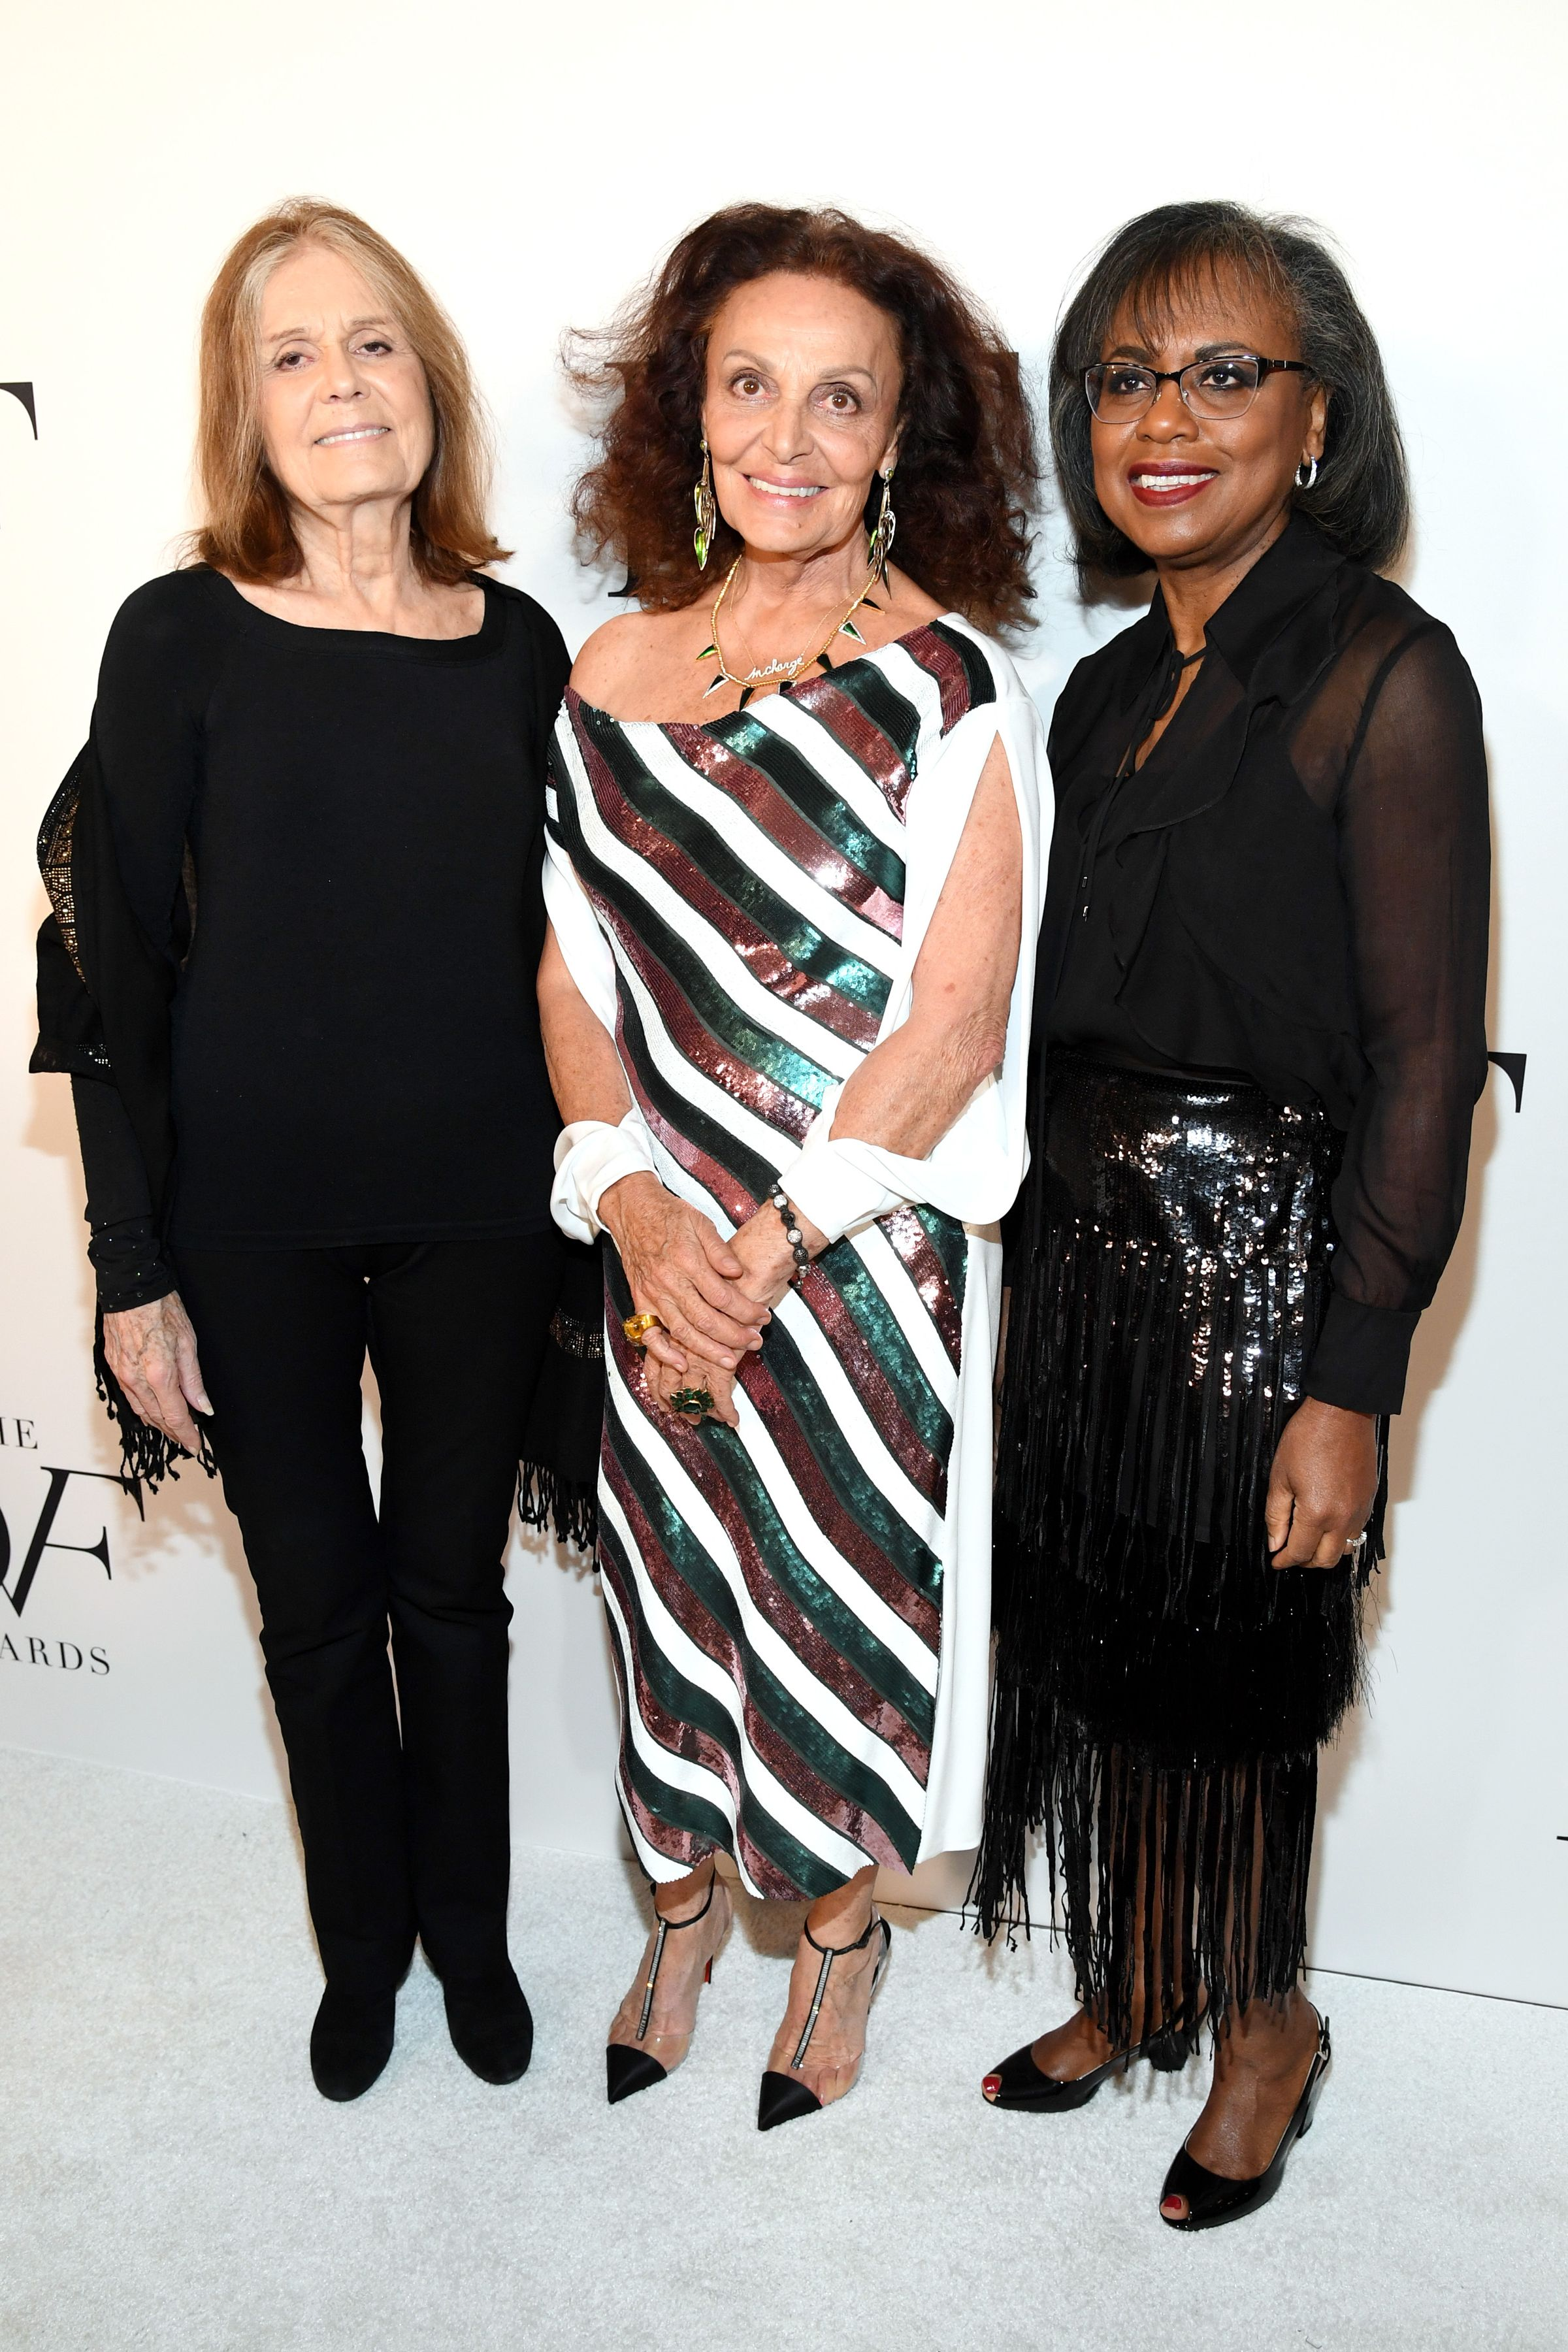 Gloria Steinem, DVF, and Anita Hill